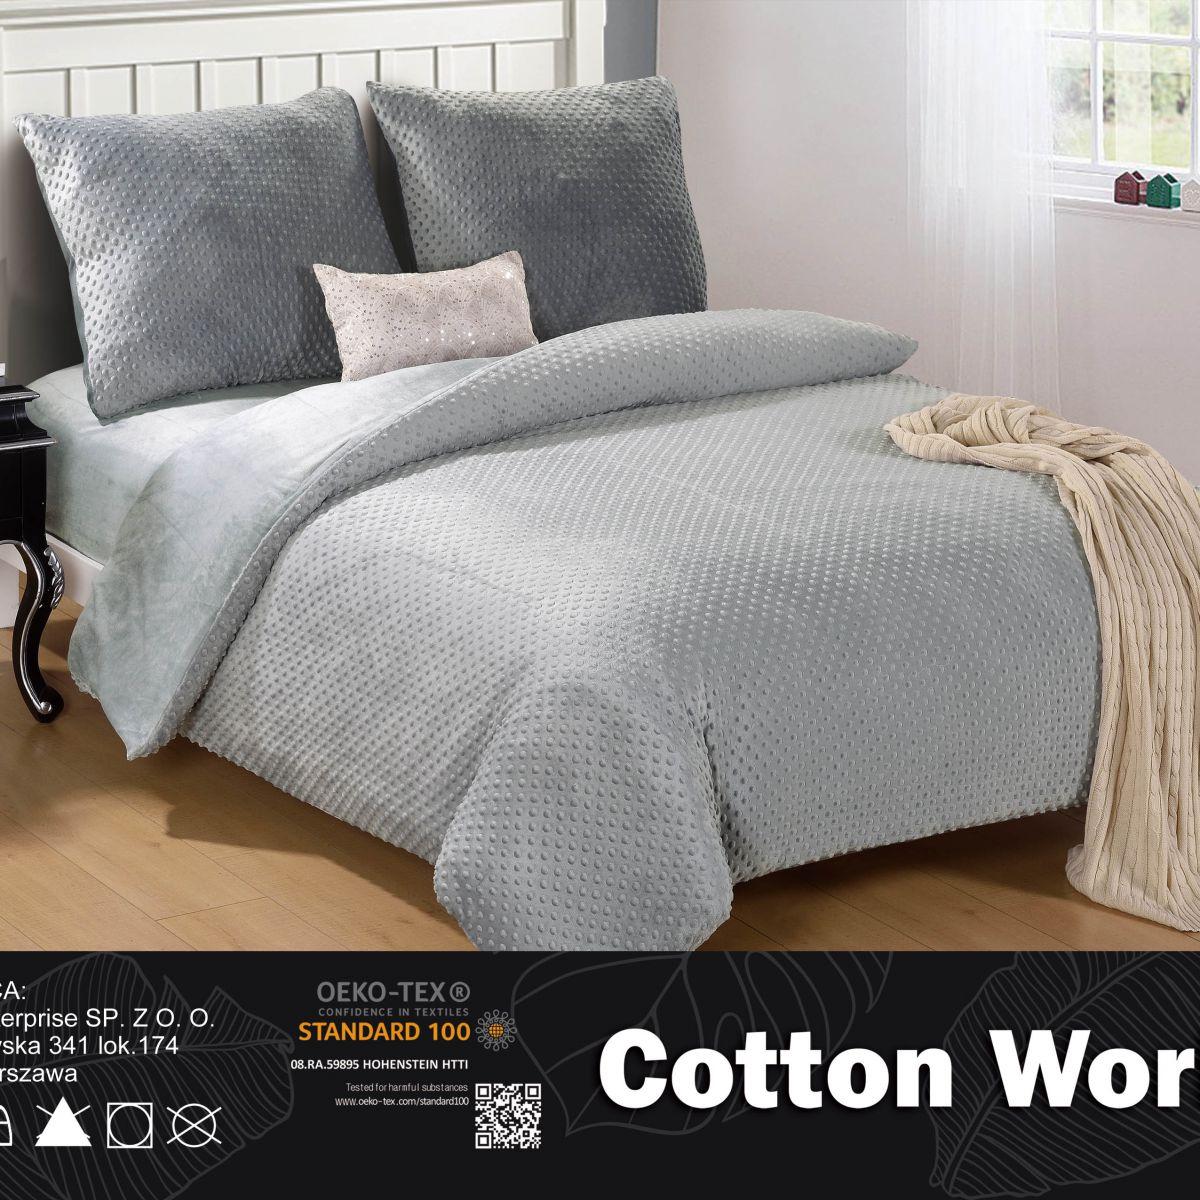 Plush Pressed Beddings - Cotton World - SHE-4701 - 220x200 cm - 3 pcs